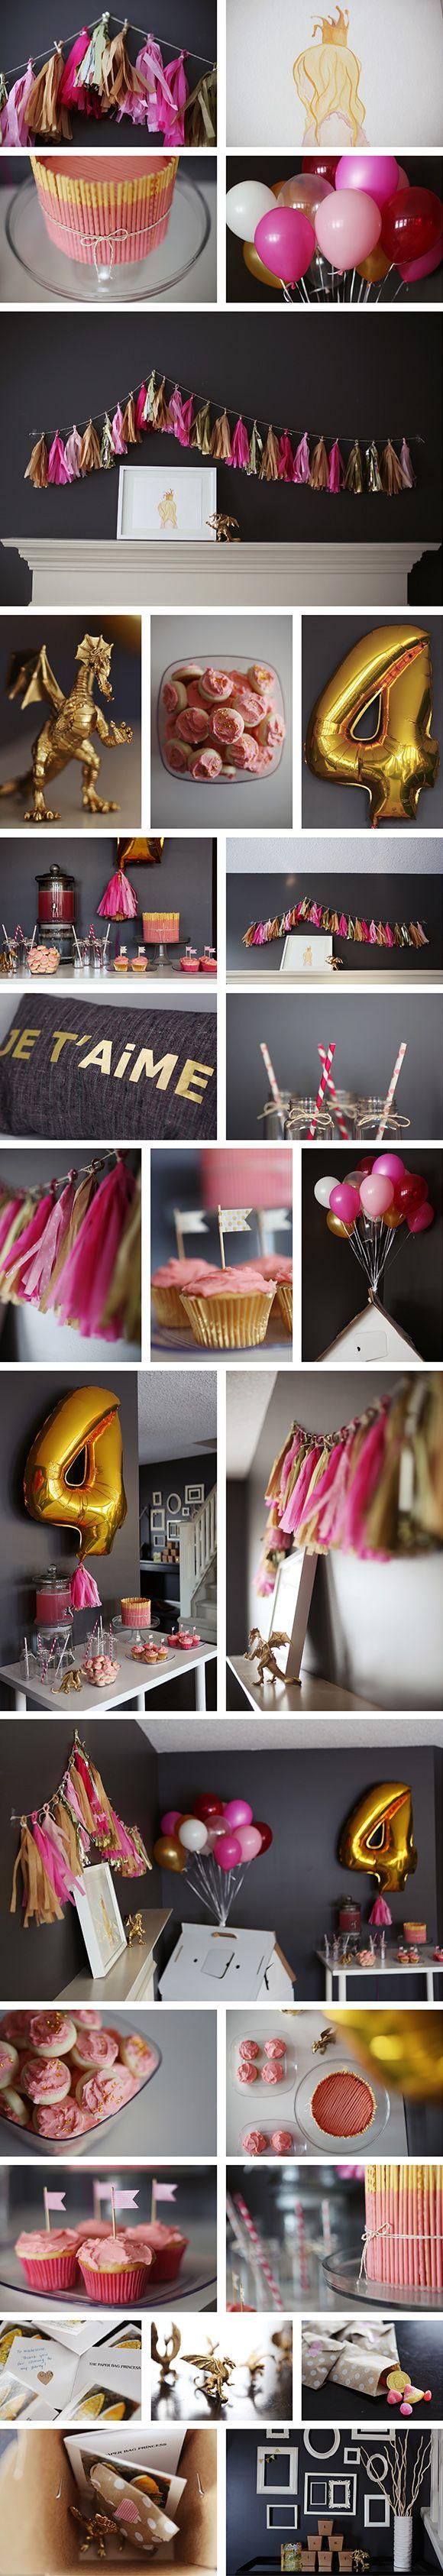 pinksugarland paper bag princess party.  Love the color scheme.